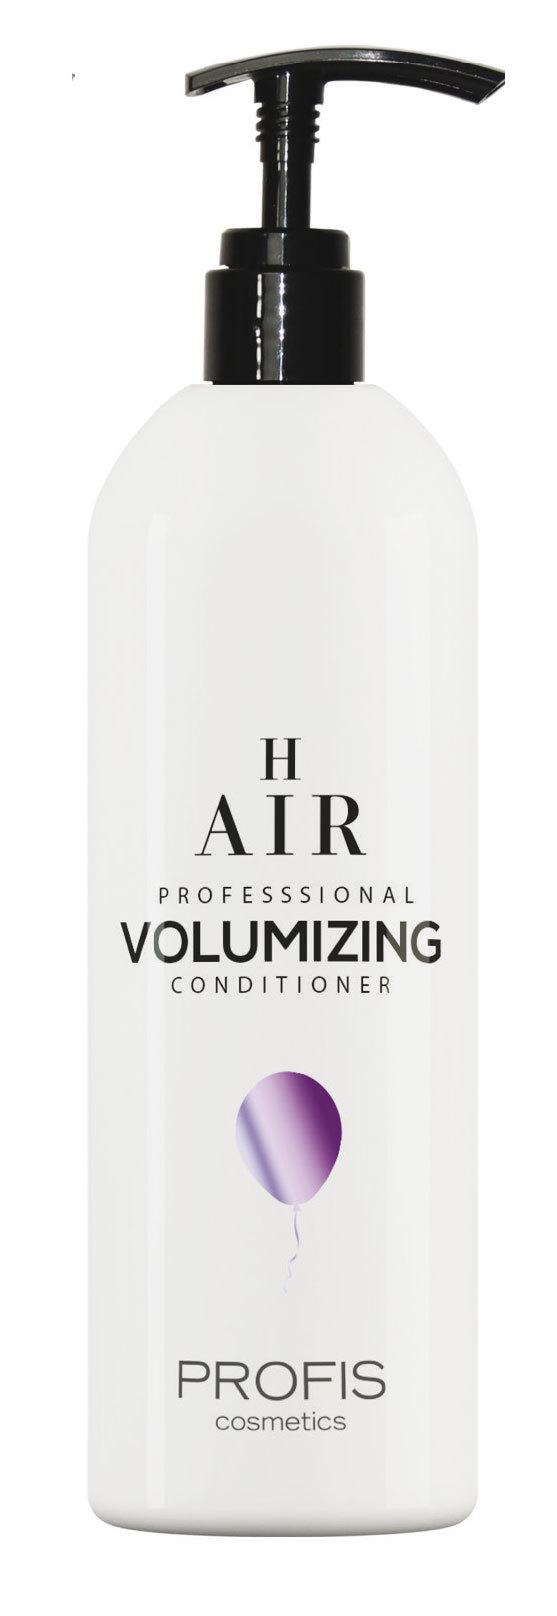 Кондиционер для объема HAIR VOLUMIZING CONDITIONER